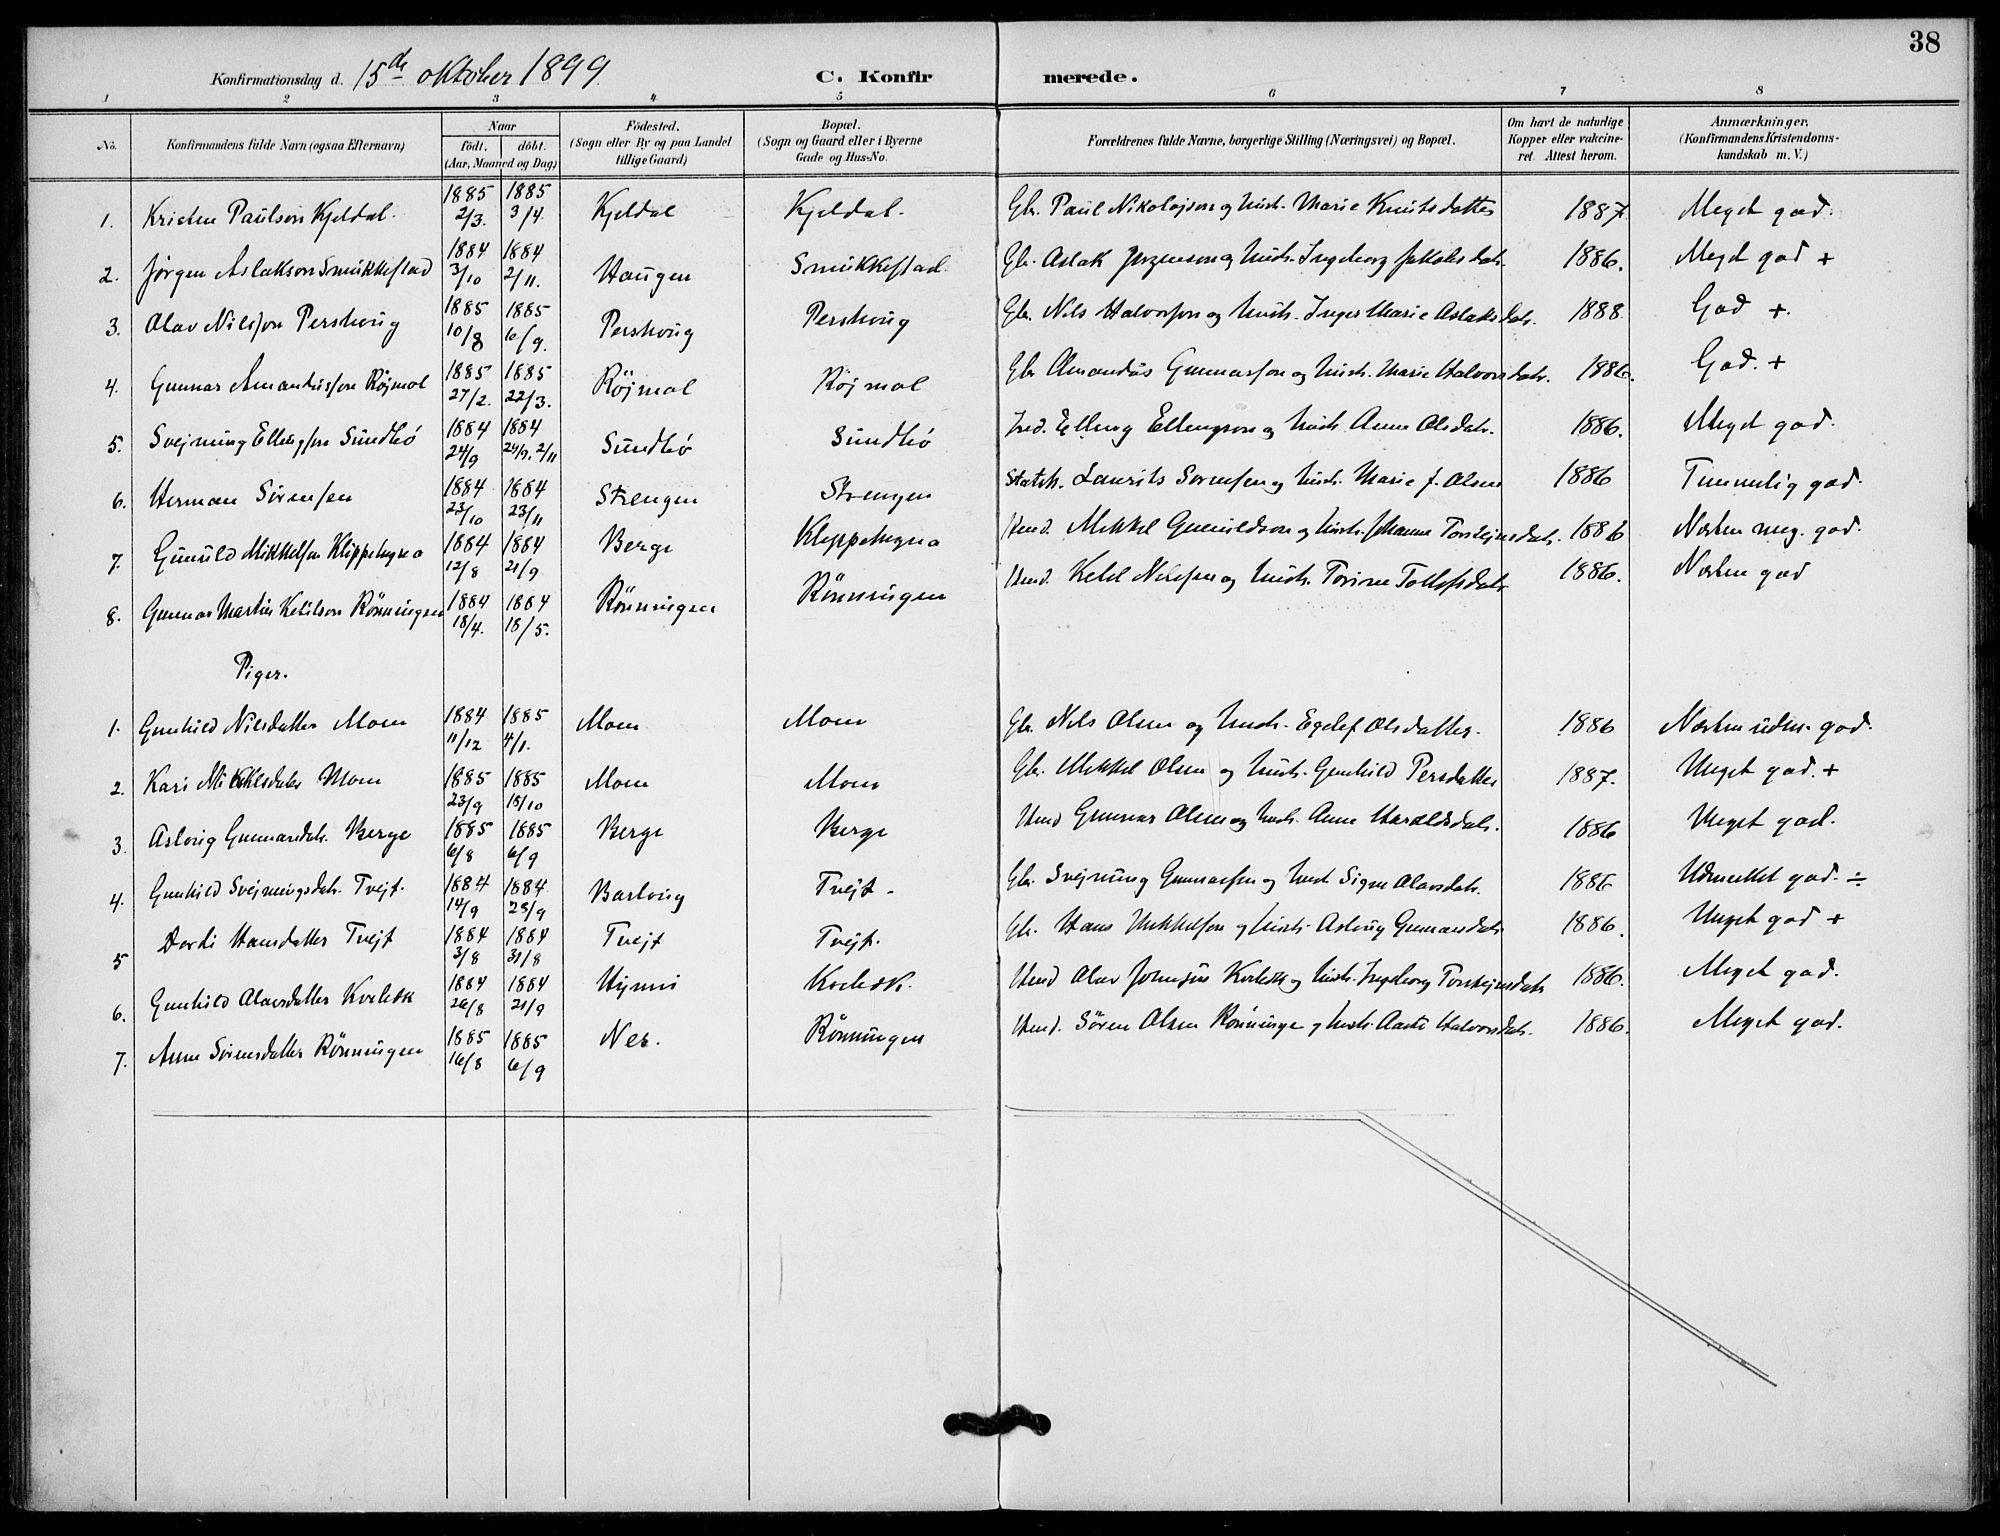 SAKO, Lunde kirkebøker, F/Fb/L0004: Ministerialbok nr. II 4, 1892-1907, s. 38